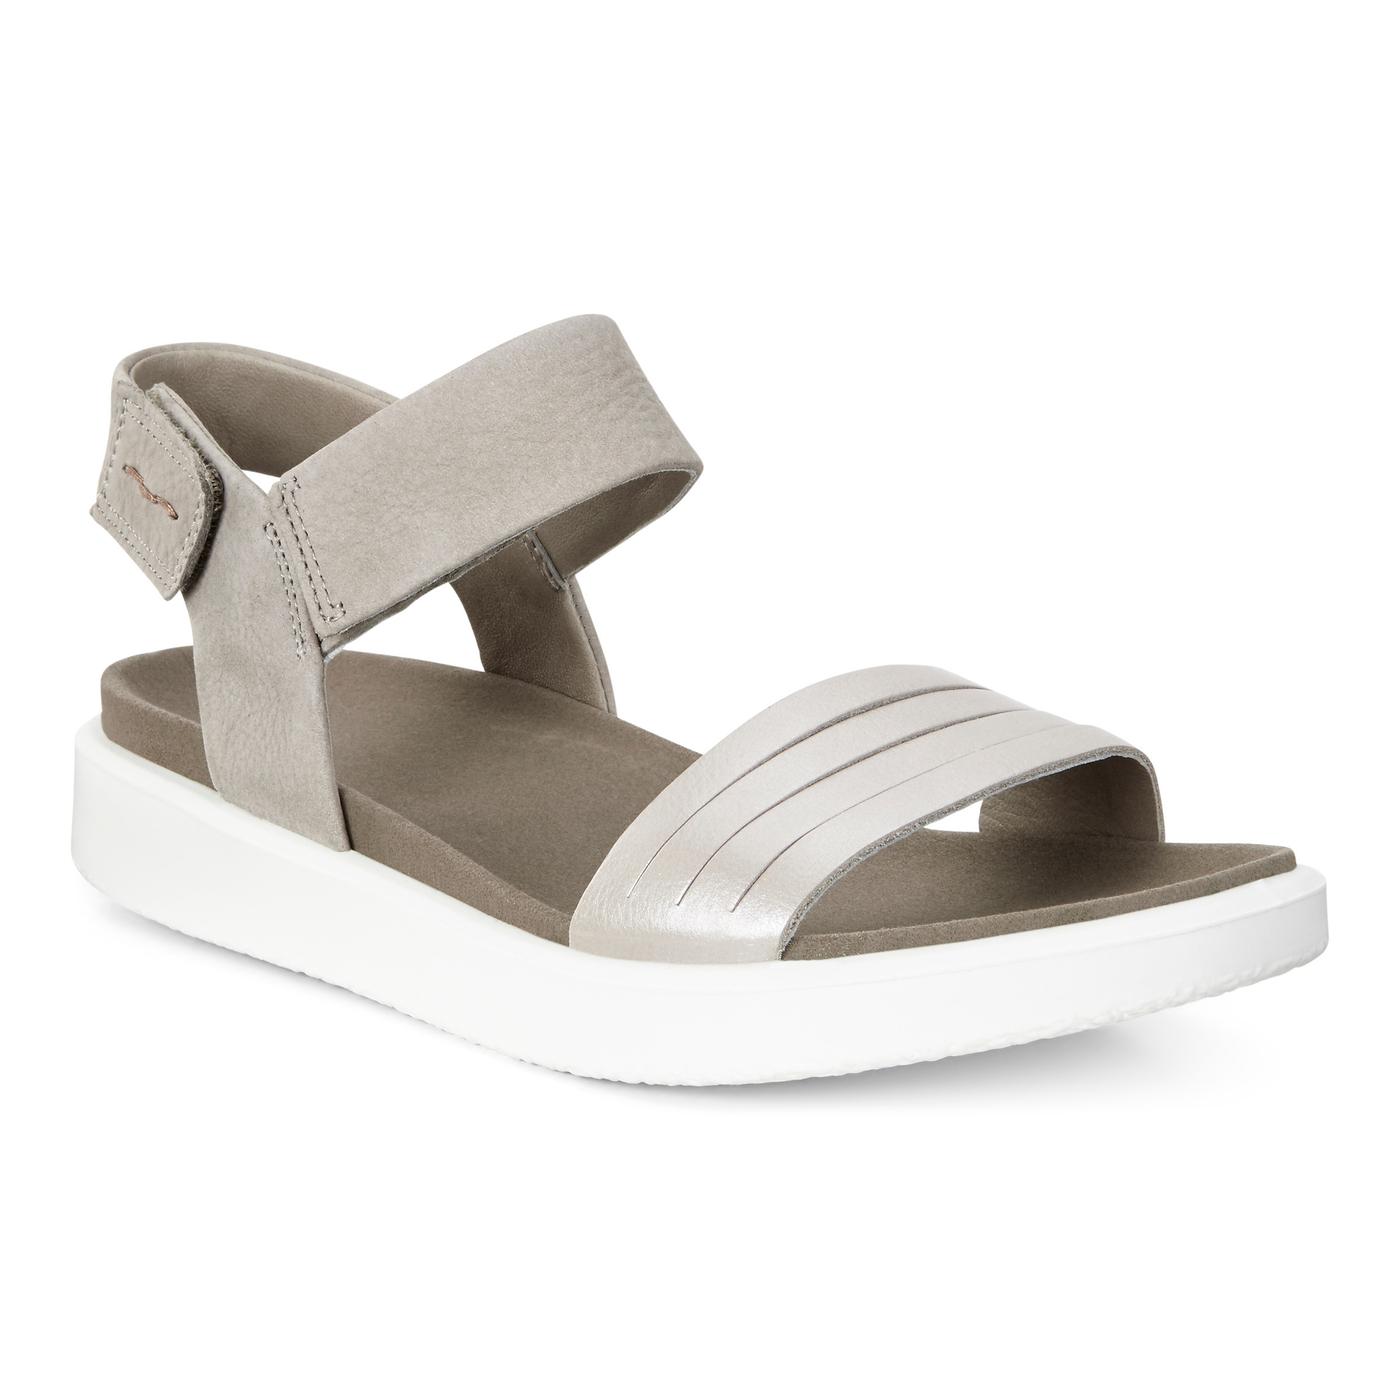 ECCO FLOWT W Flat Sandal